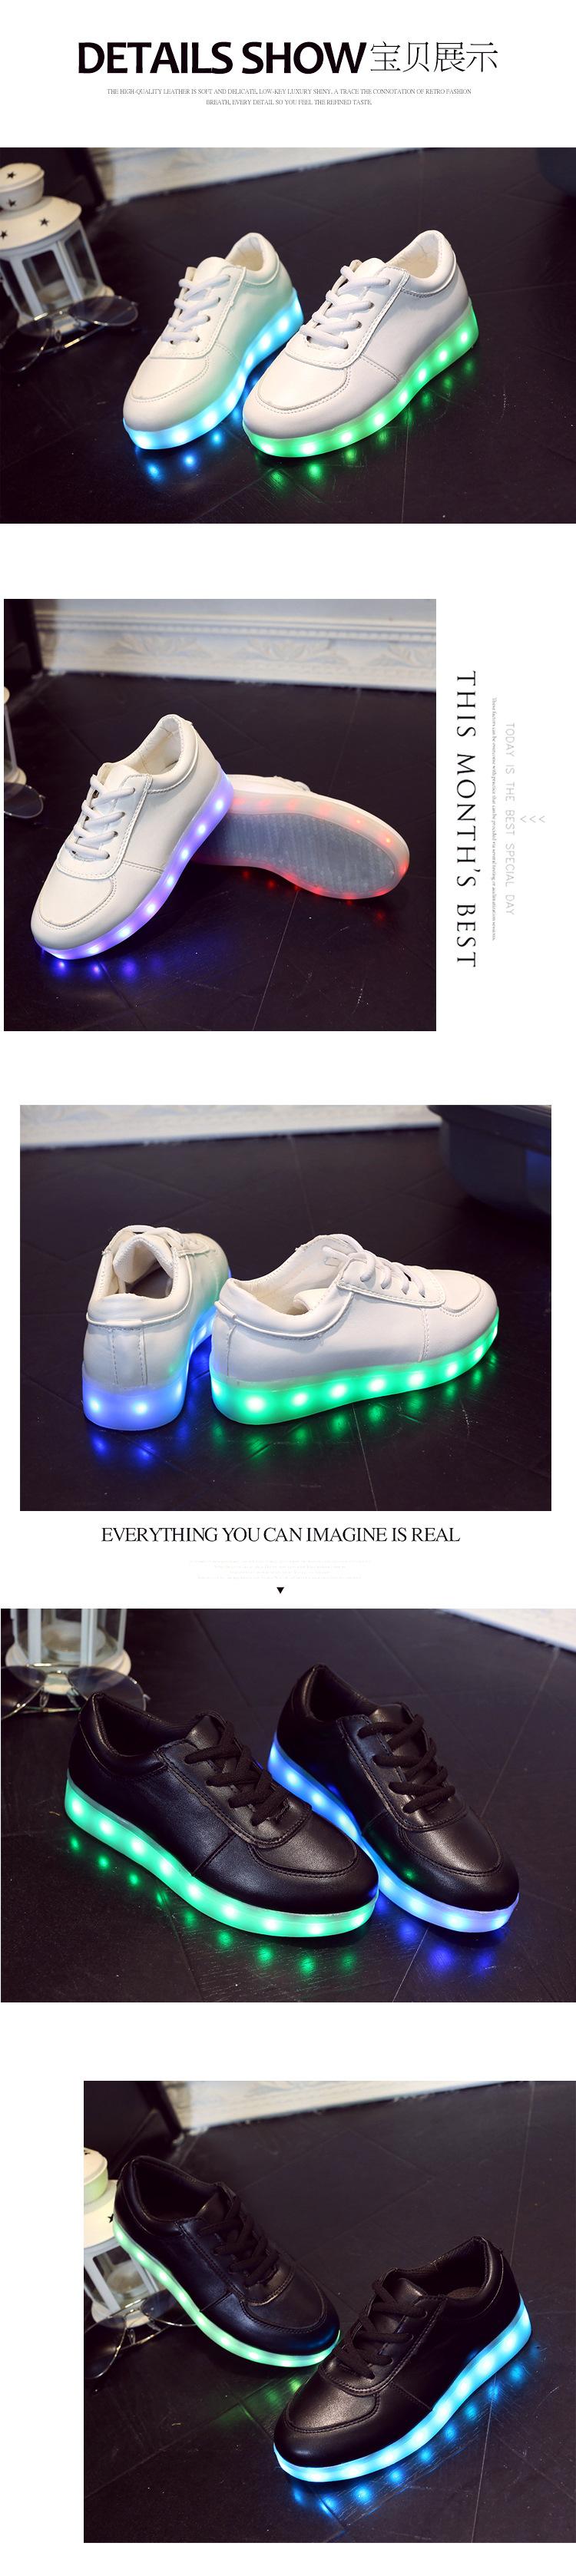 989d97b2818b7 usb childrens bright child shoes white basket led kids trainers girl ...